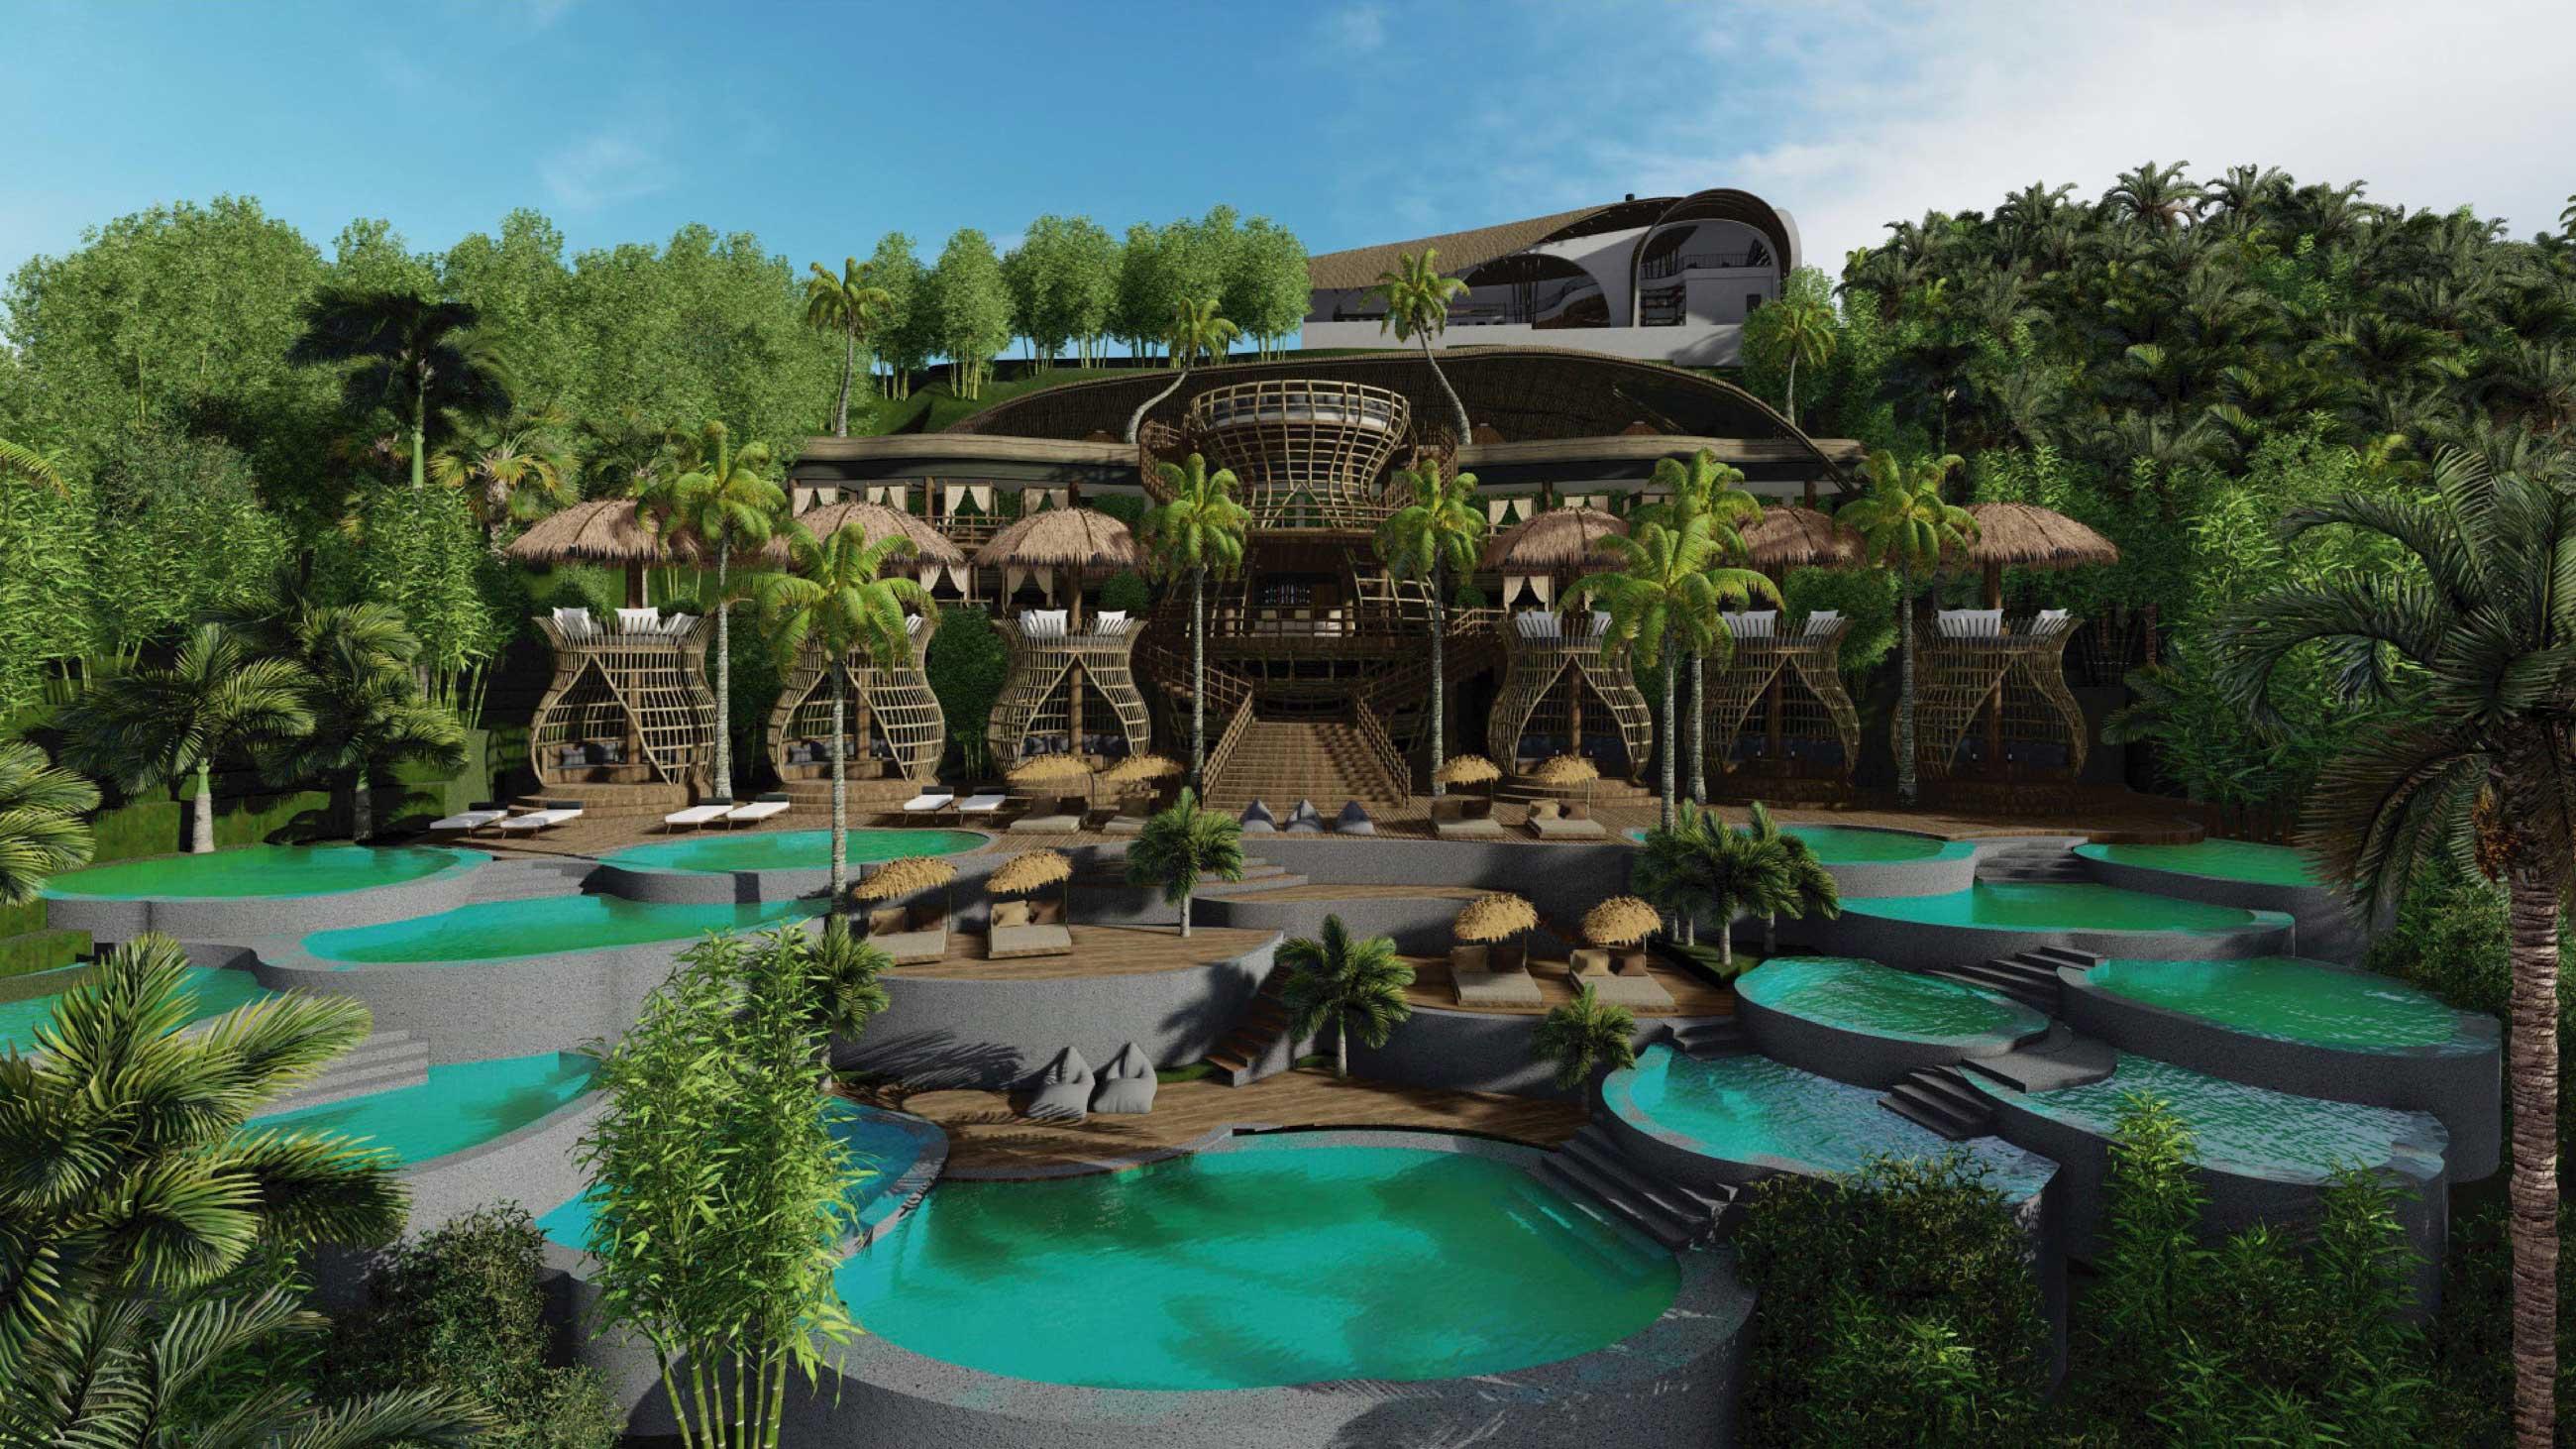 Bali Property For Sale And Real Estate Kibarer Property